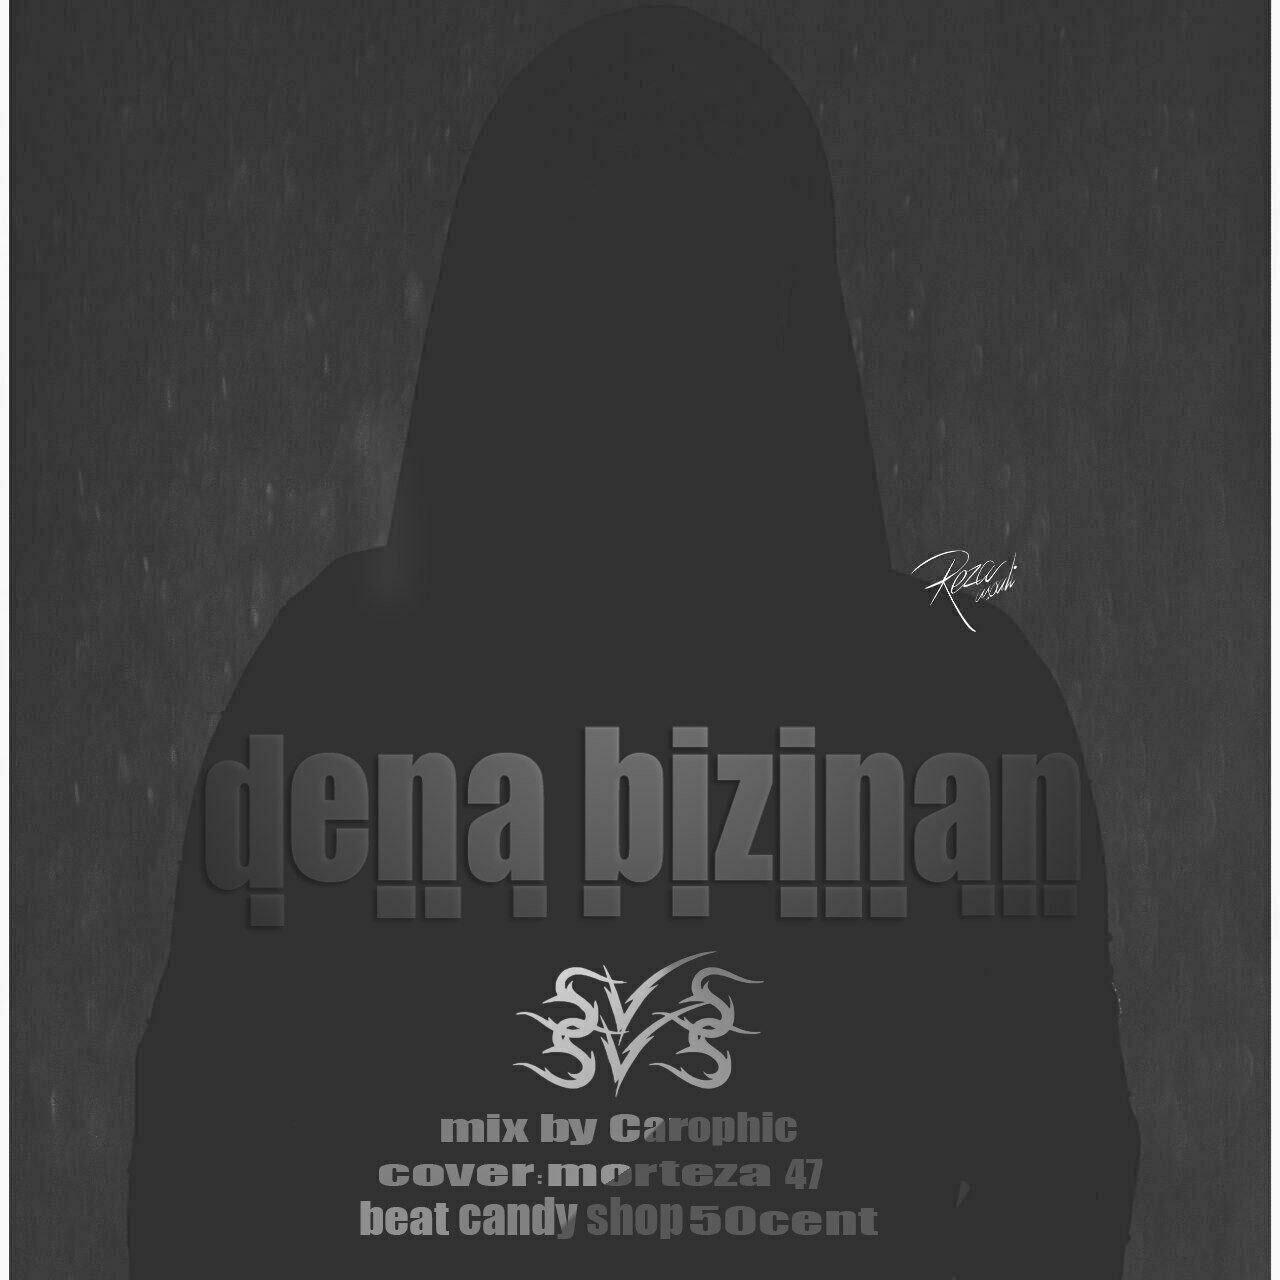 http://s9.picofile.com/file/8300831500/084Svs_Dena_Bizinan.jpg